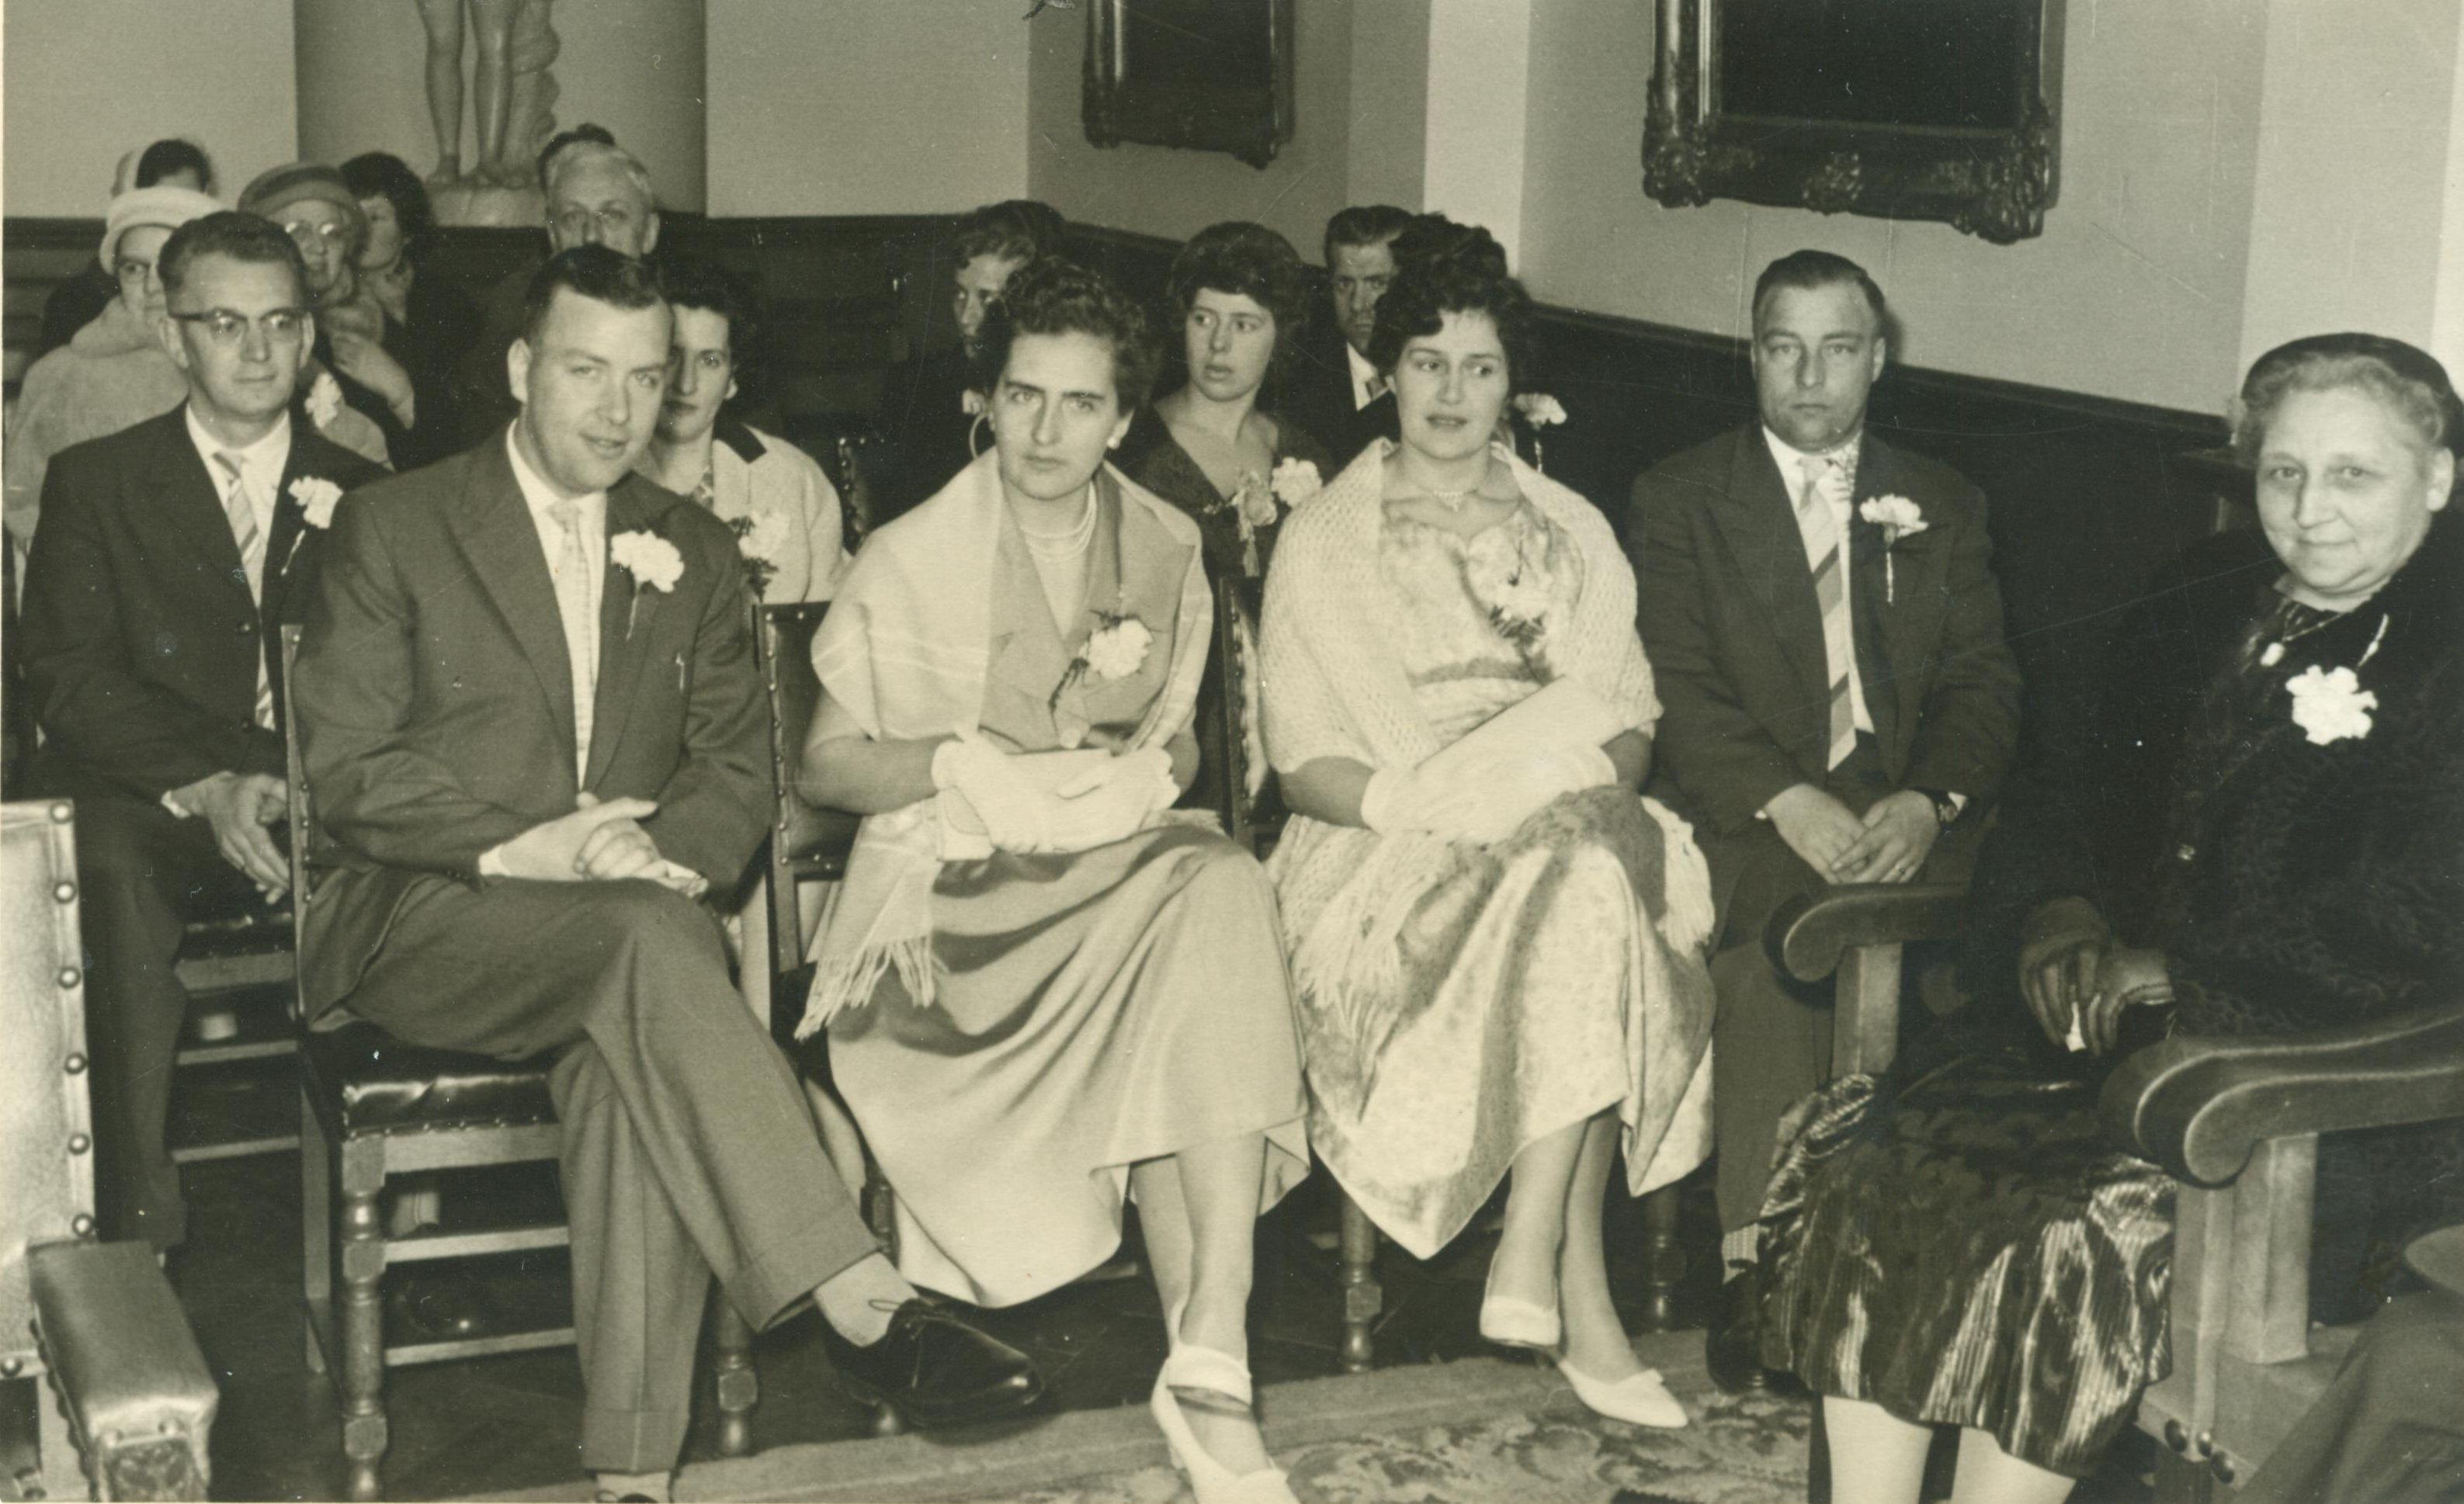 Johannes Pieter Brouwer (1929-2012), Wilhelmina Gijsberta Gaasbeek (1929-2005), Catharina Joanna Maria van Geel (1937-1976), Marinus Maria Brouwer (1927-2017)